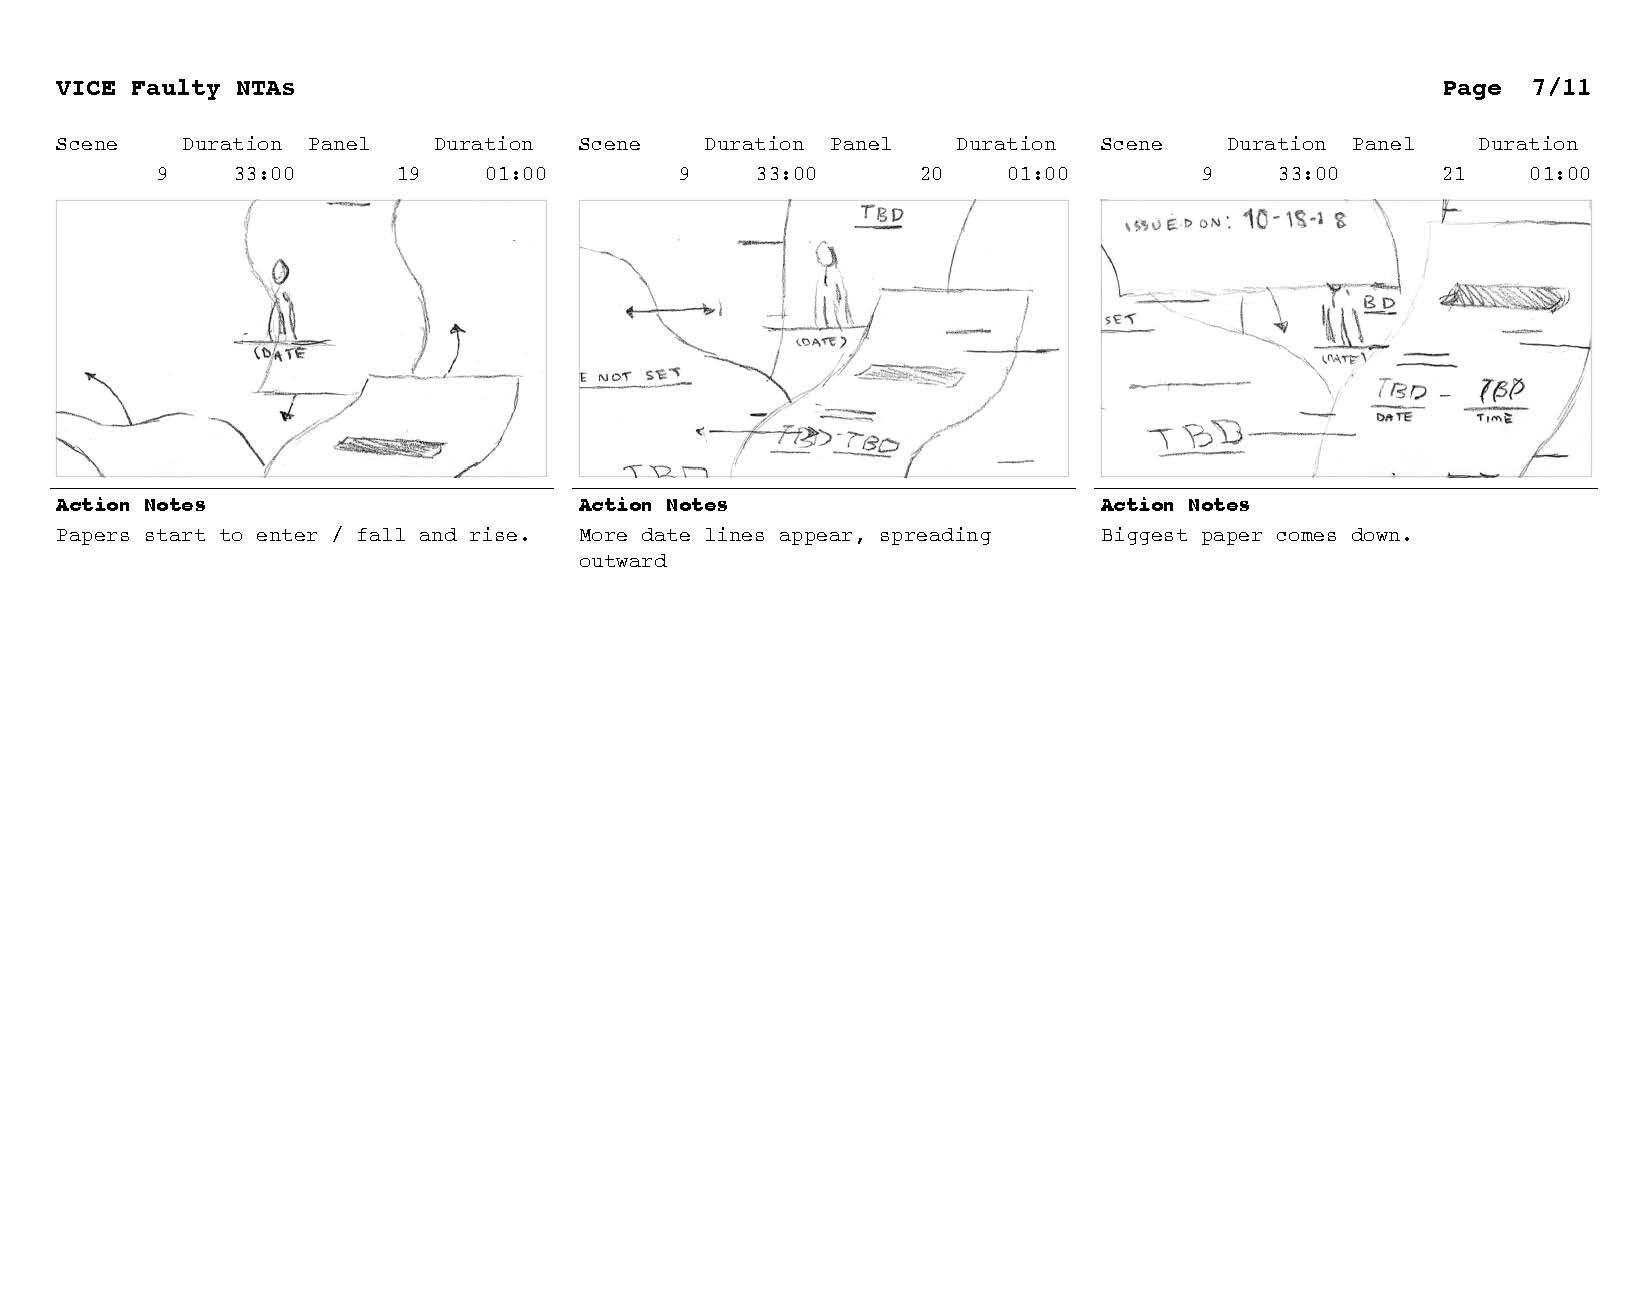 VICE News Tonight - Faulty NTAs storyboard_Page_07.jpg